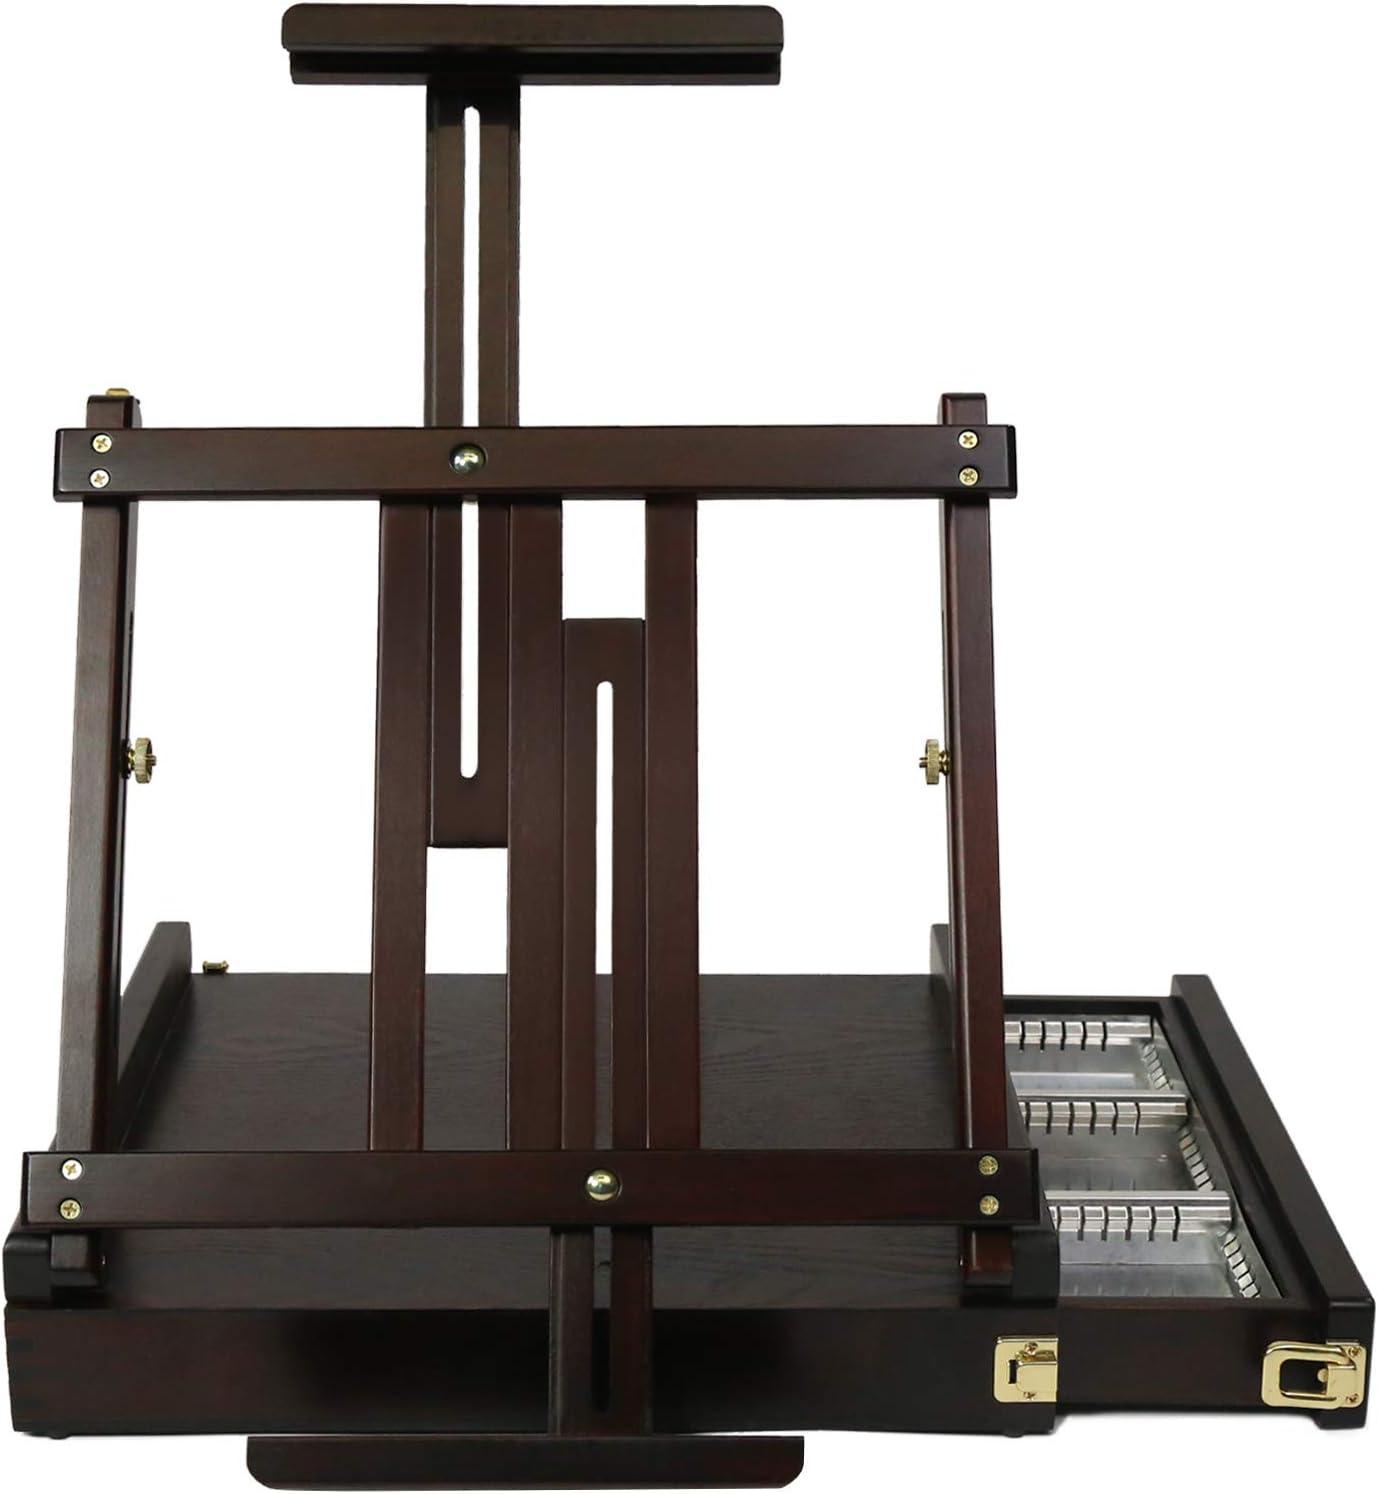 Popular standard MEEDEN Studio Sketchbox Table Easel with Special price - Metal Ad Drawer Lined